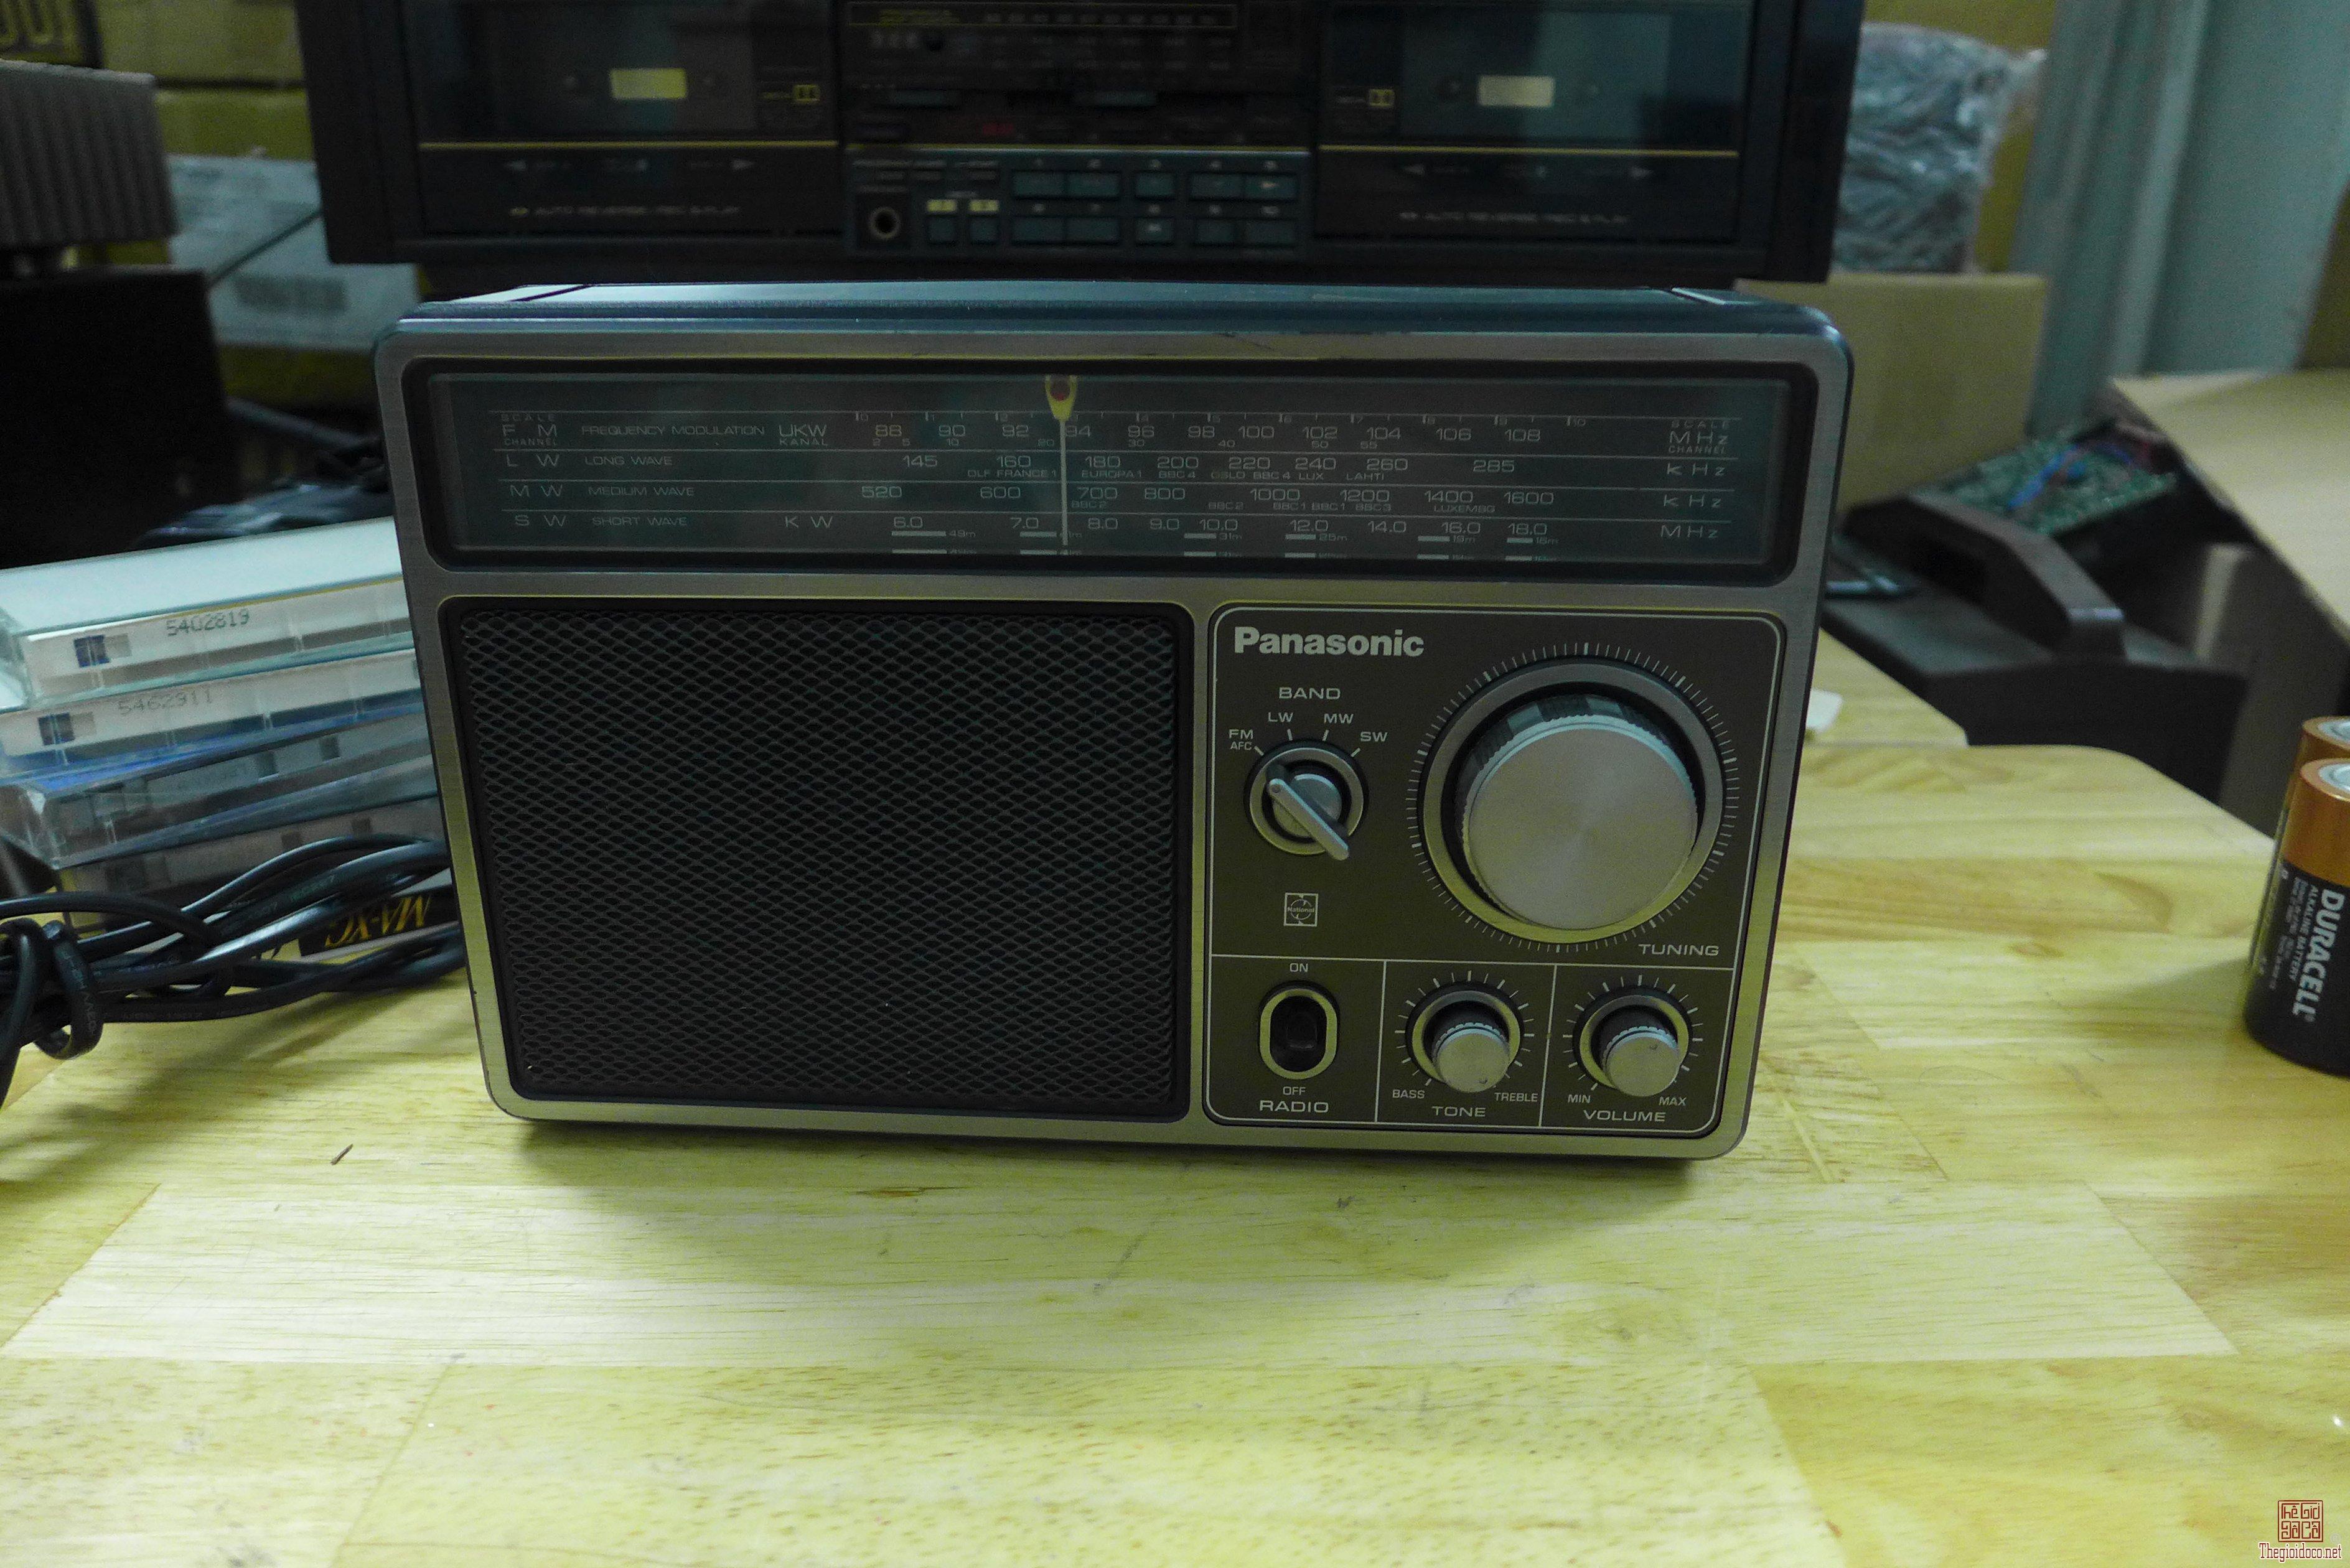 HCM - Q10 - Bán radio Panasonic 1105DLBE